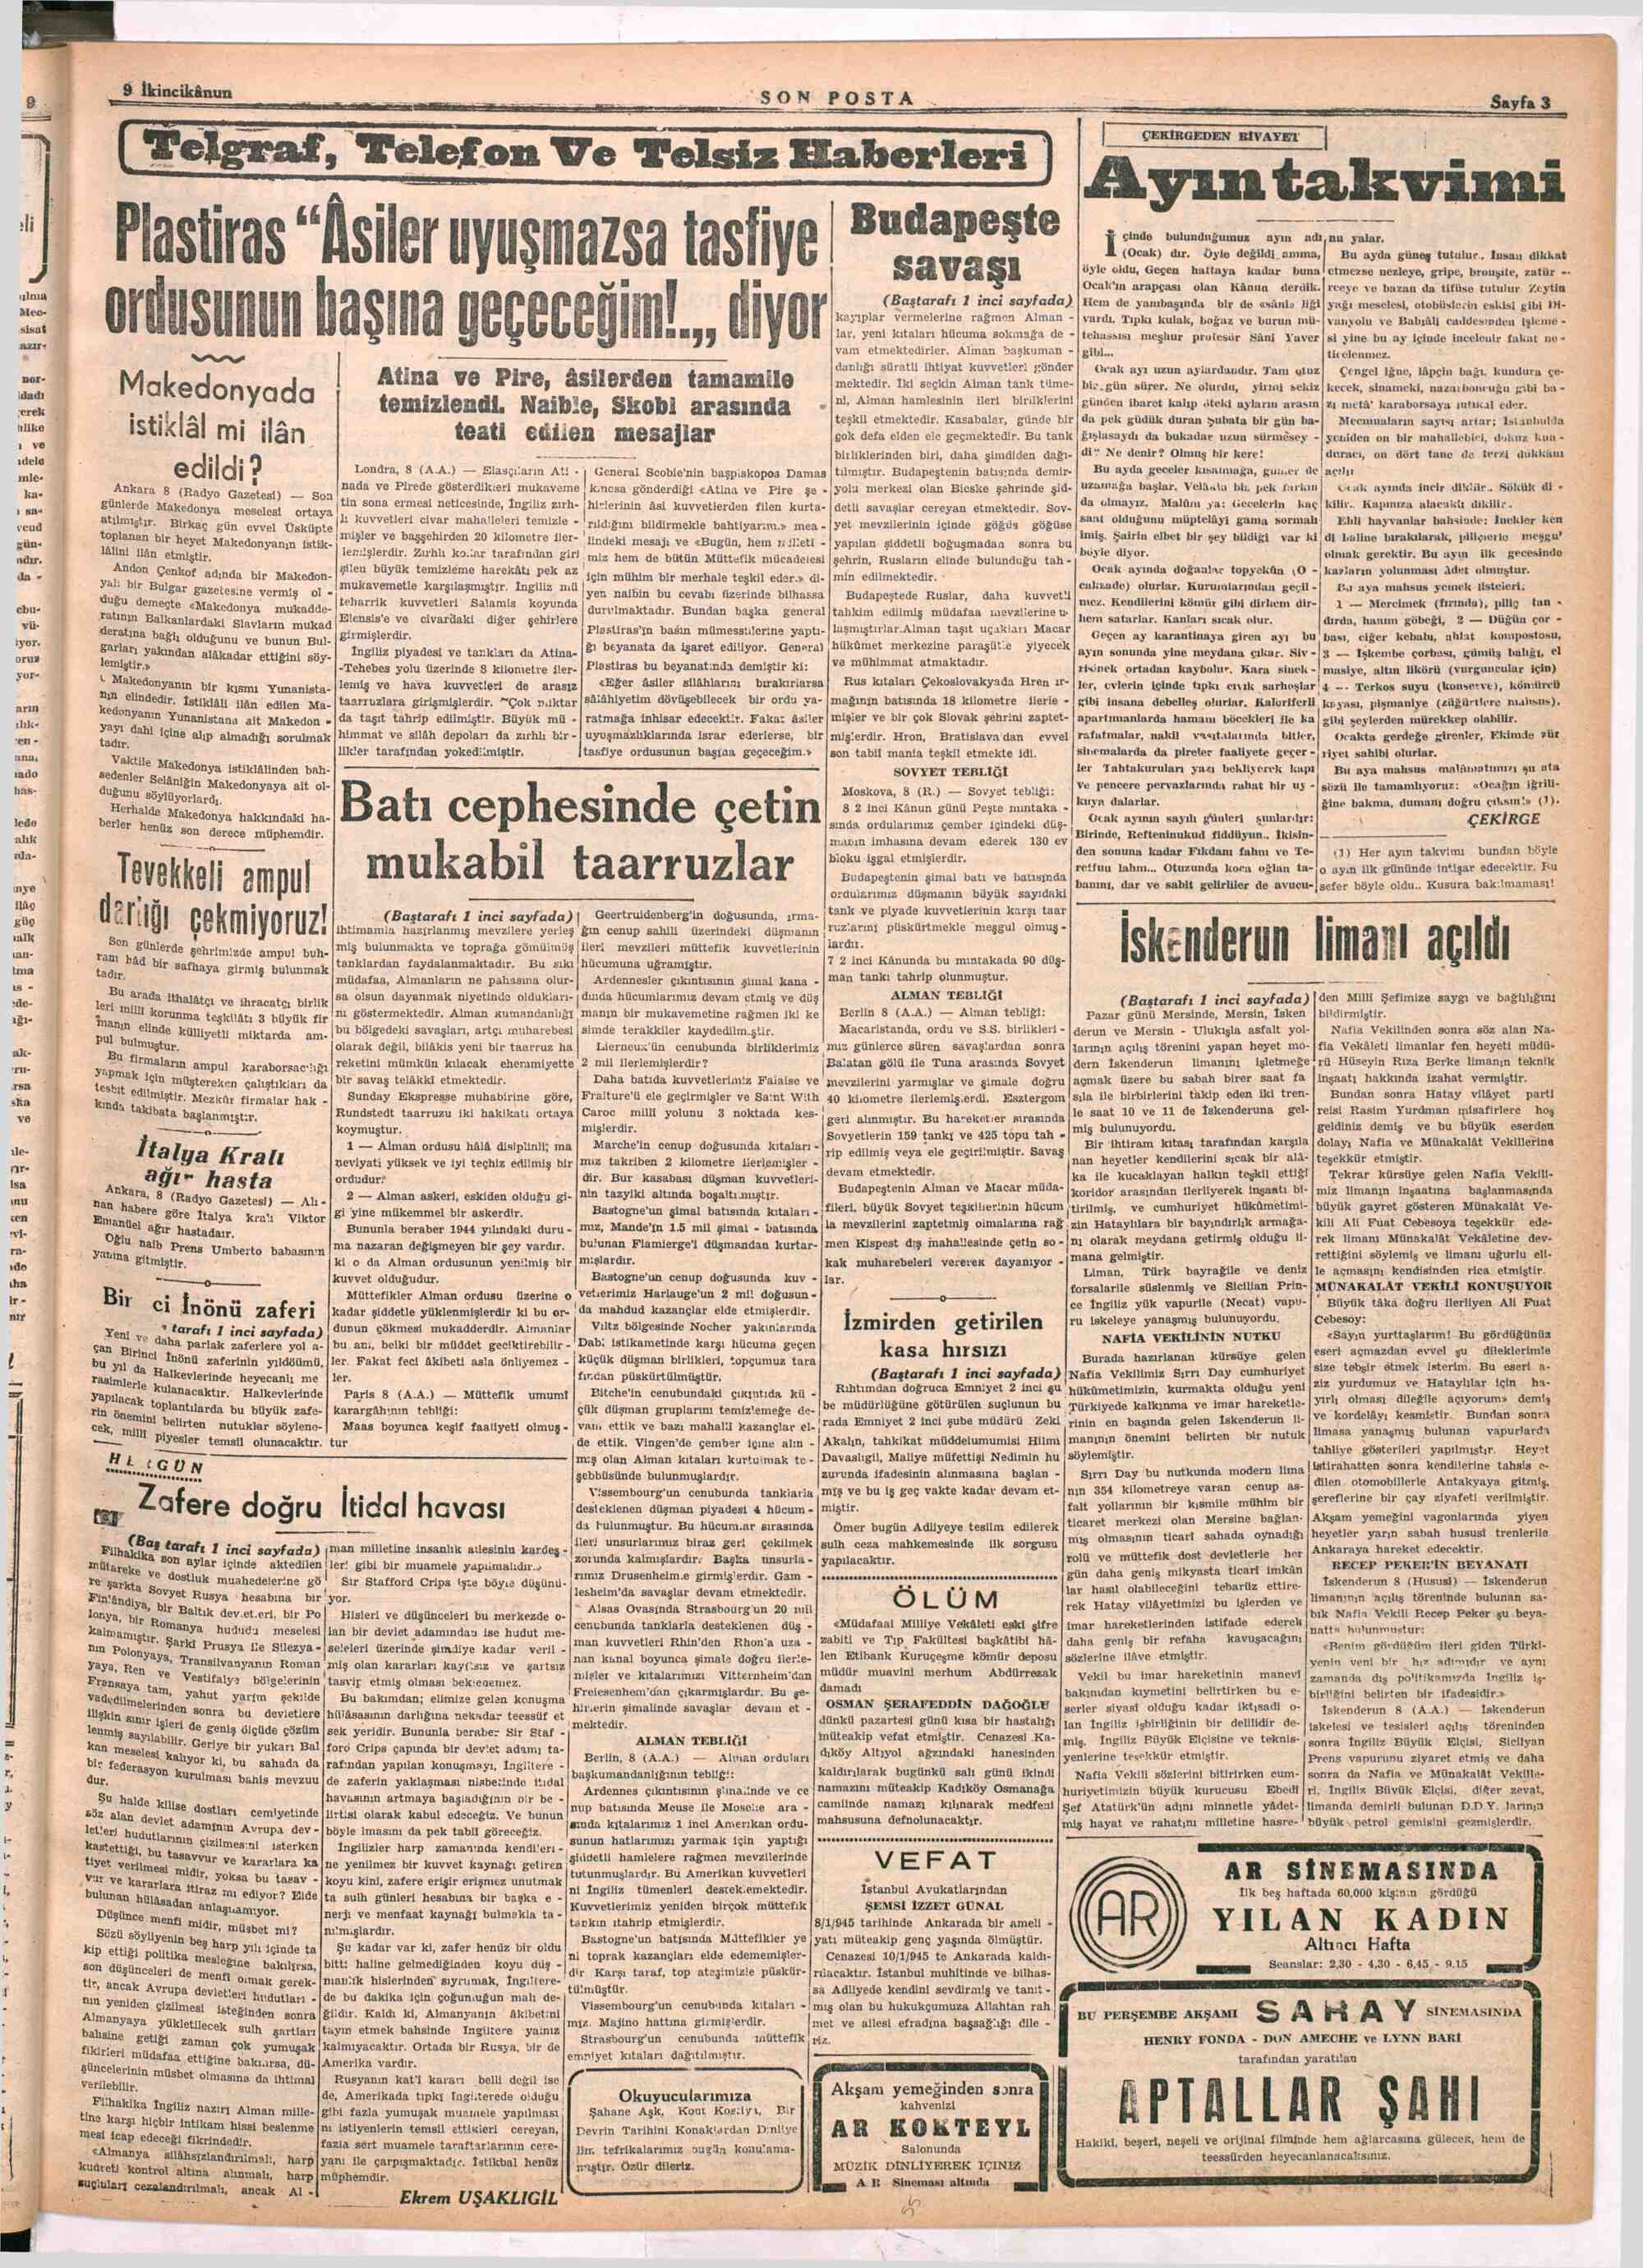 9 Ocak 1945 Tarihli Son Posta Dergisi Sayfa 3